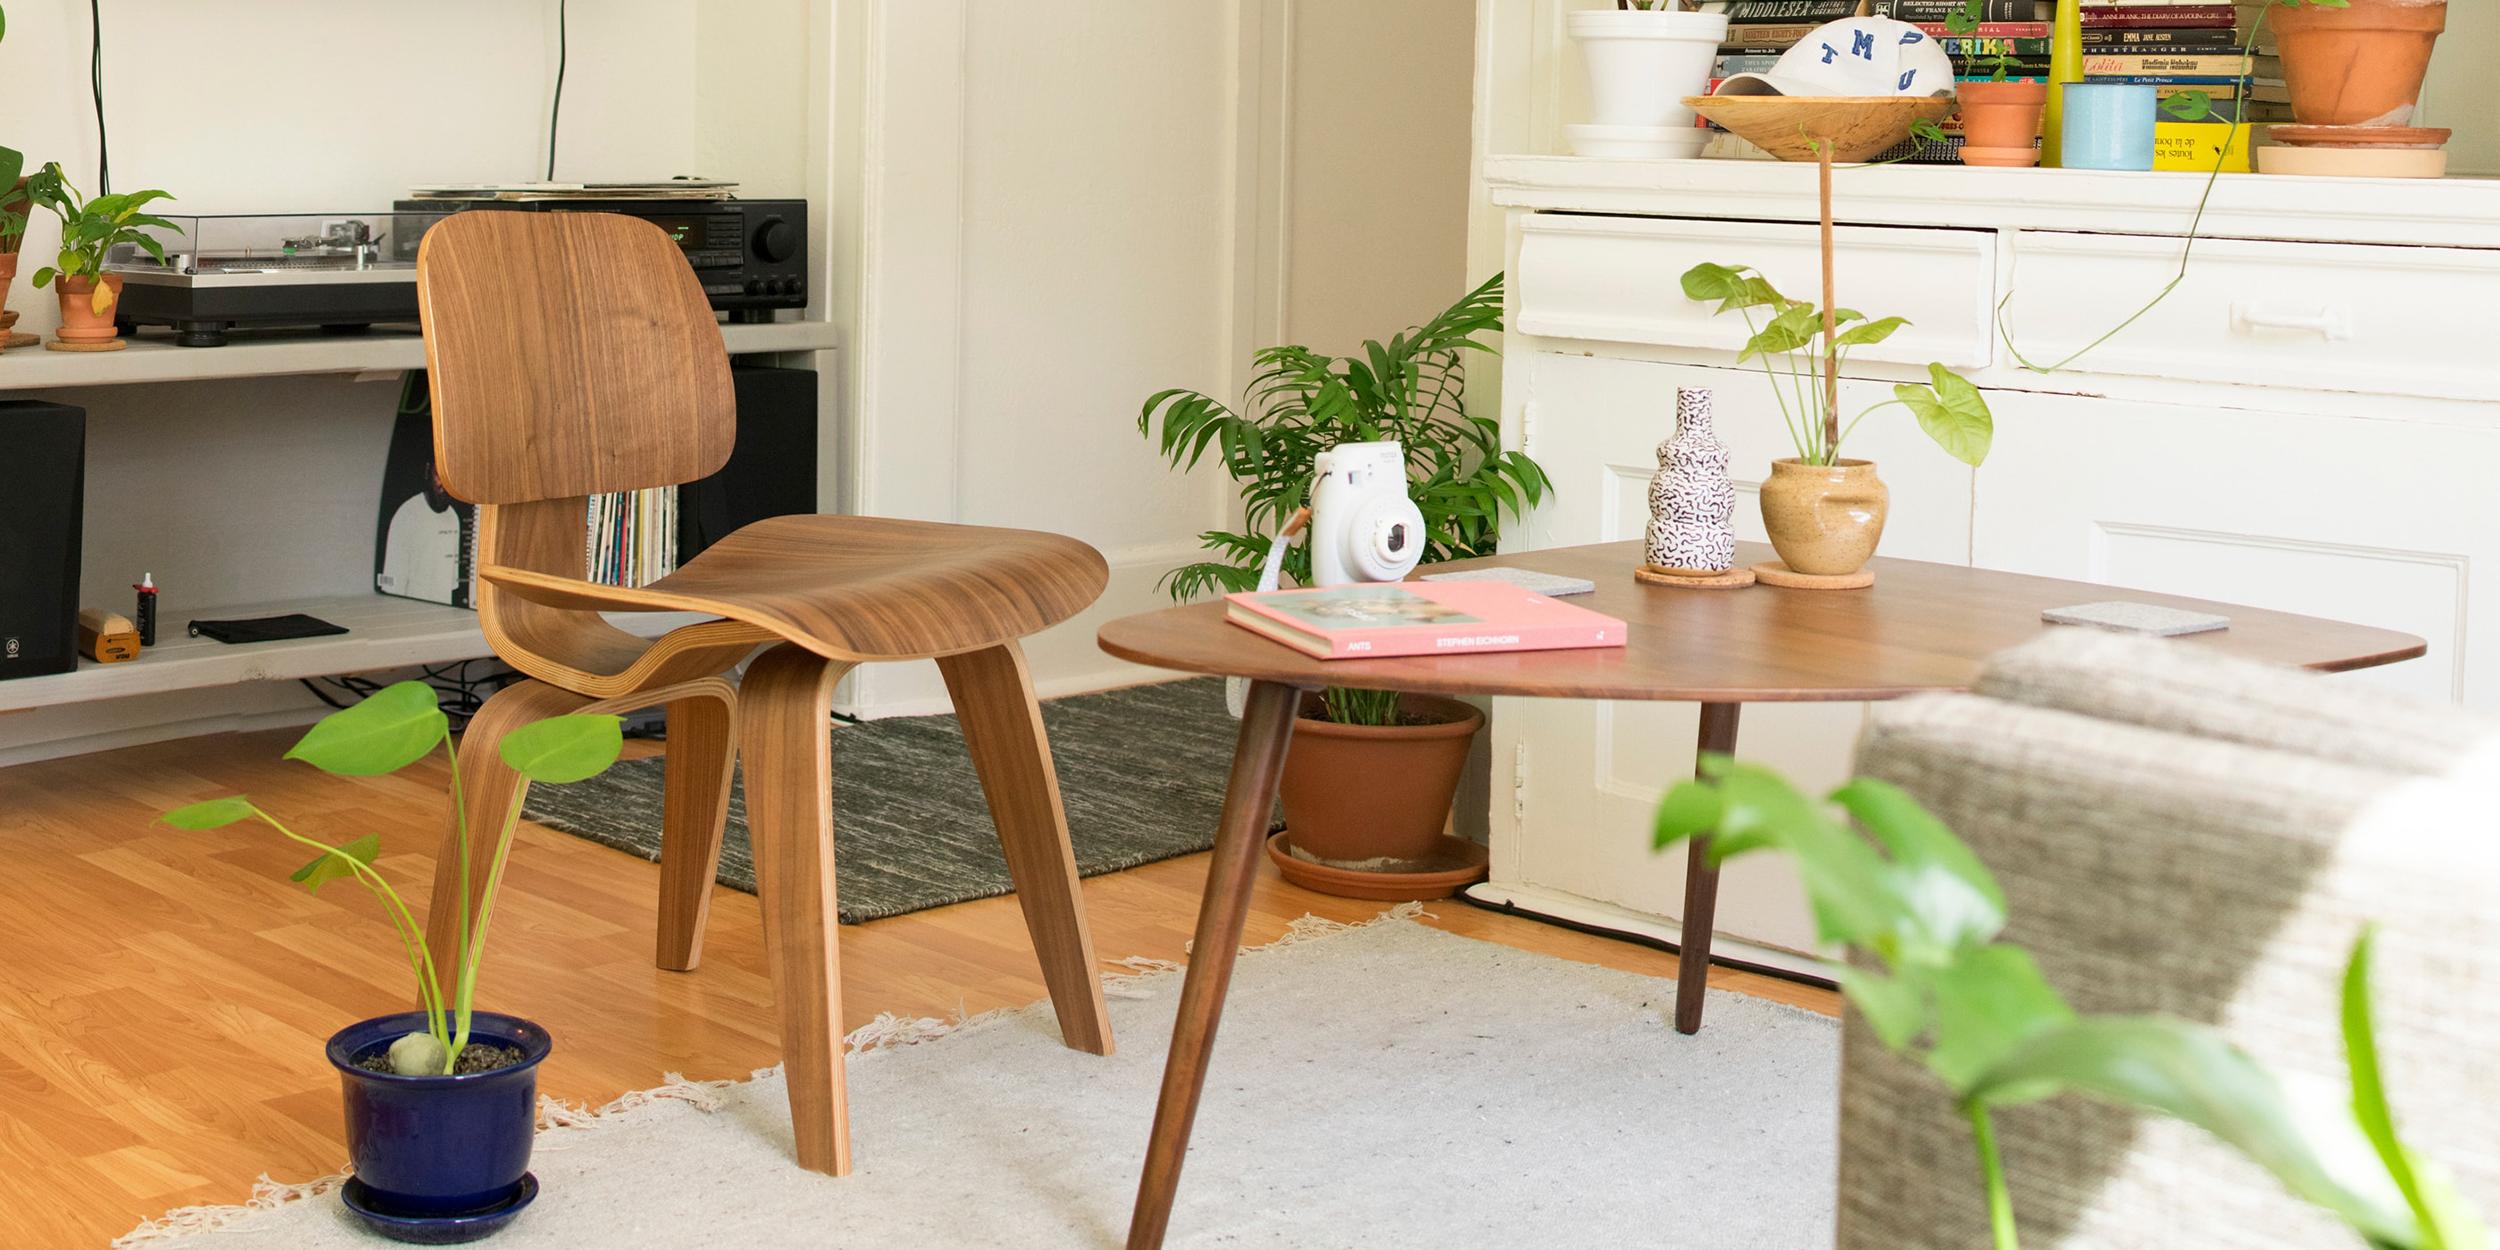 Eames Walnut LCW Chair